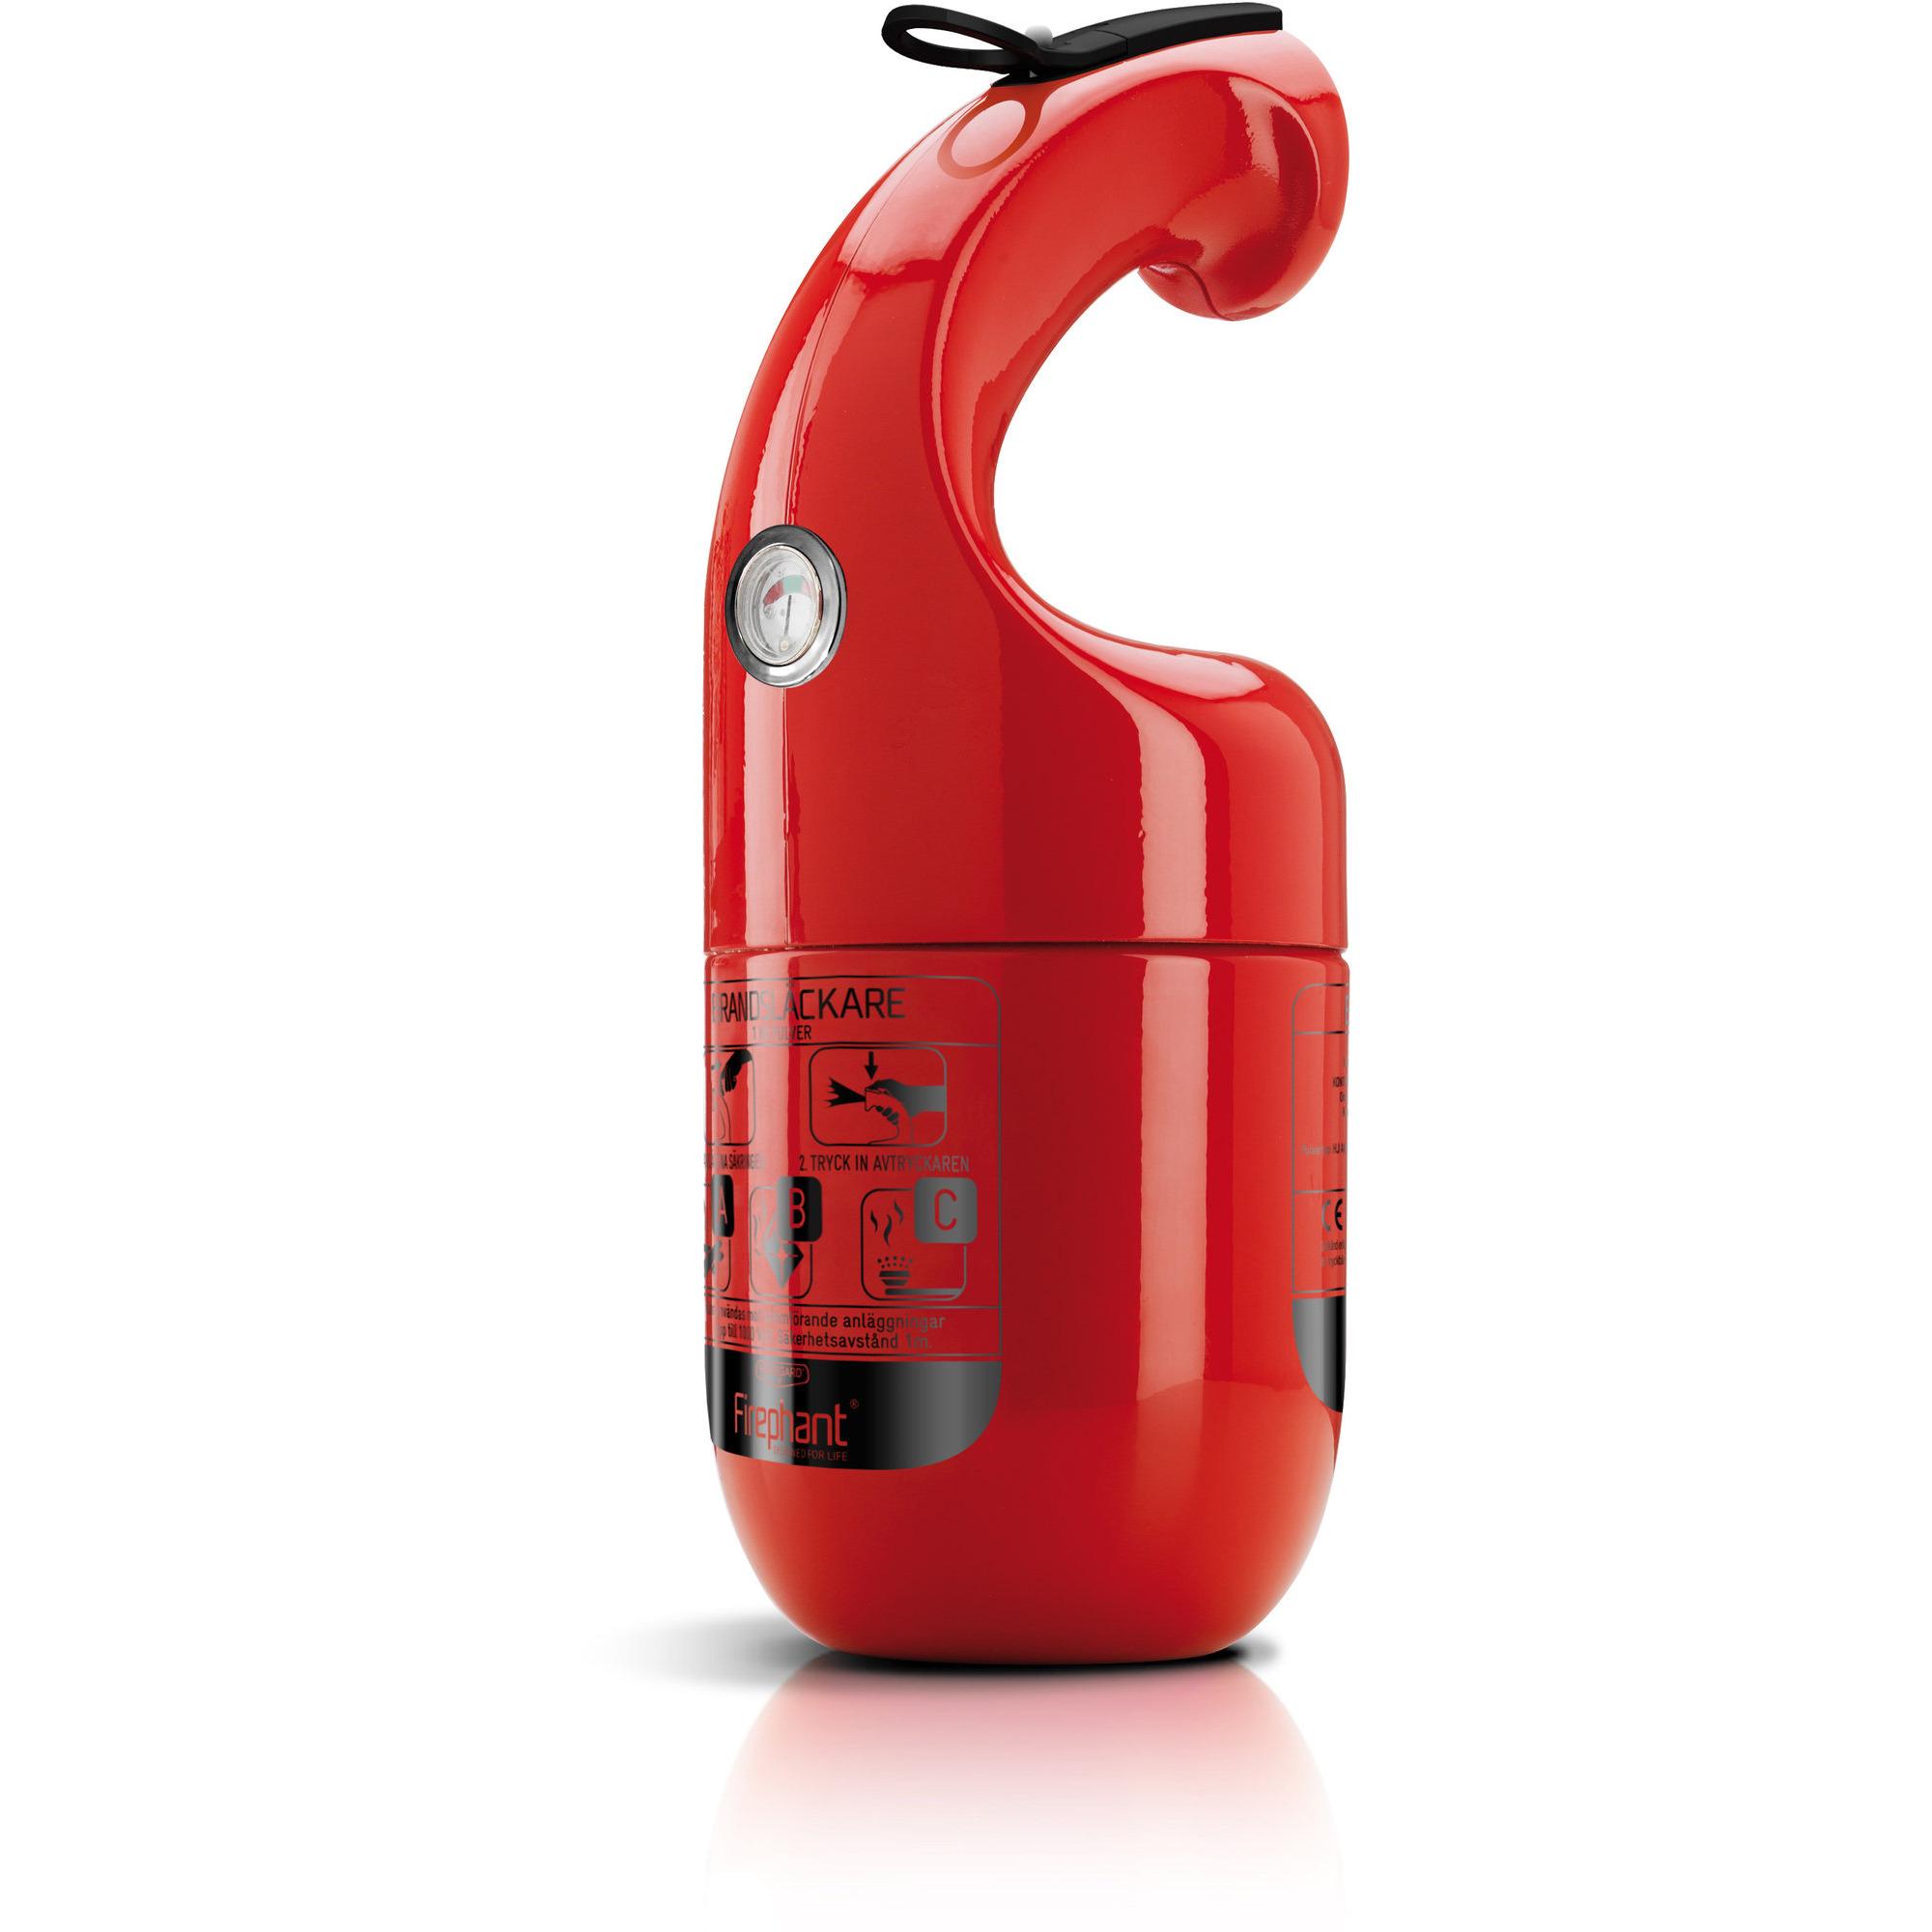 Firephant 8A34BC 1 kg Pulversläckare Röd